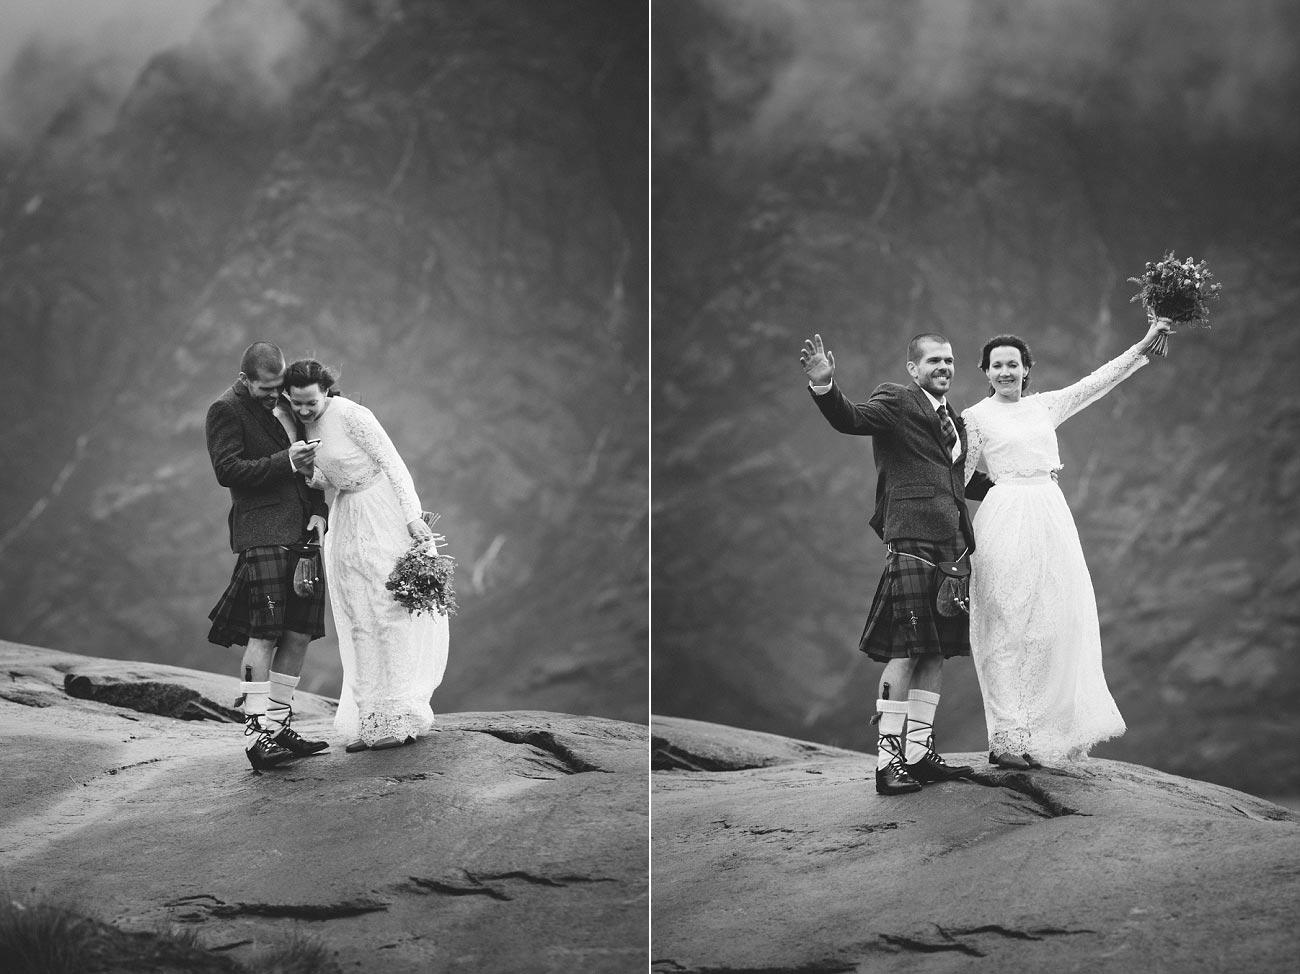 isle of skye wedding photography elopement loch coruisk humanist outdoor weddings scottish highlands 0049